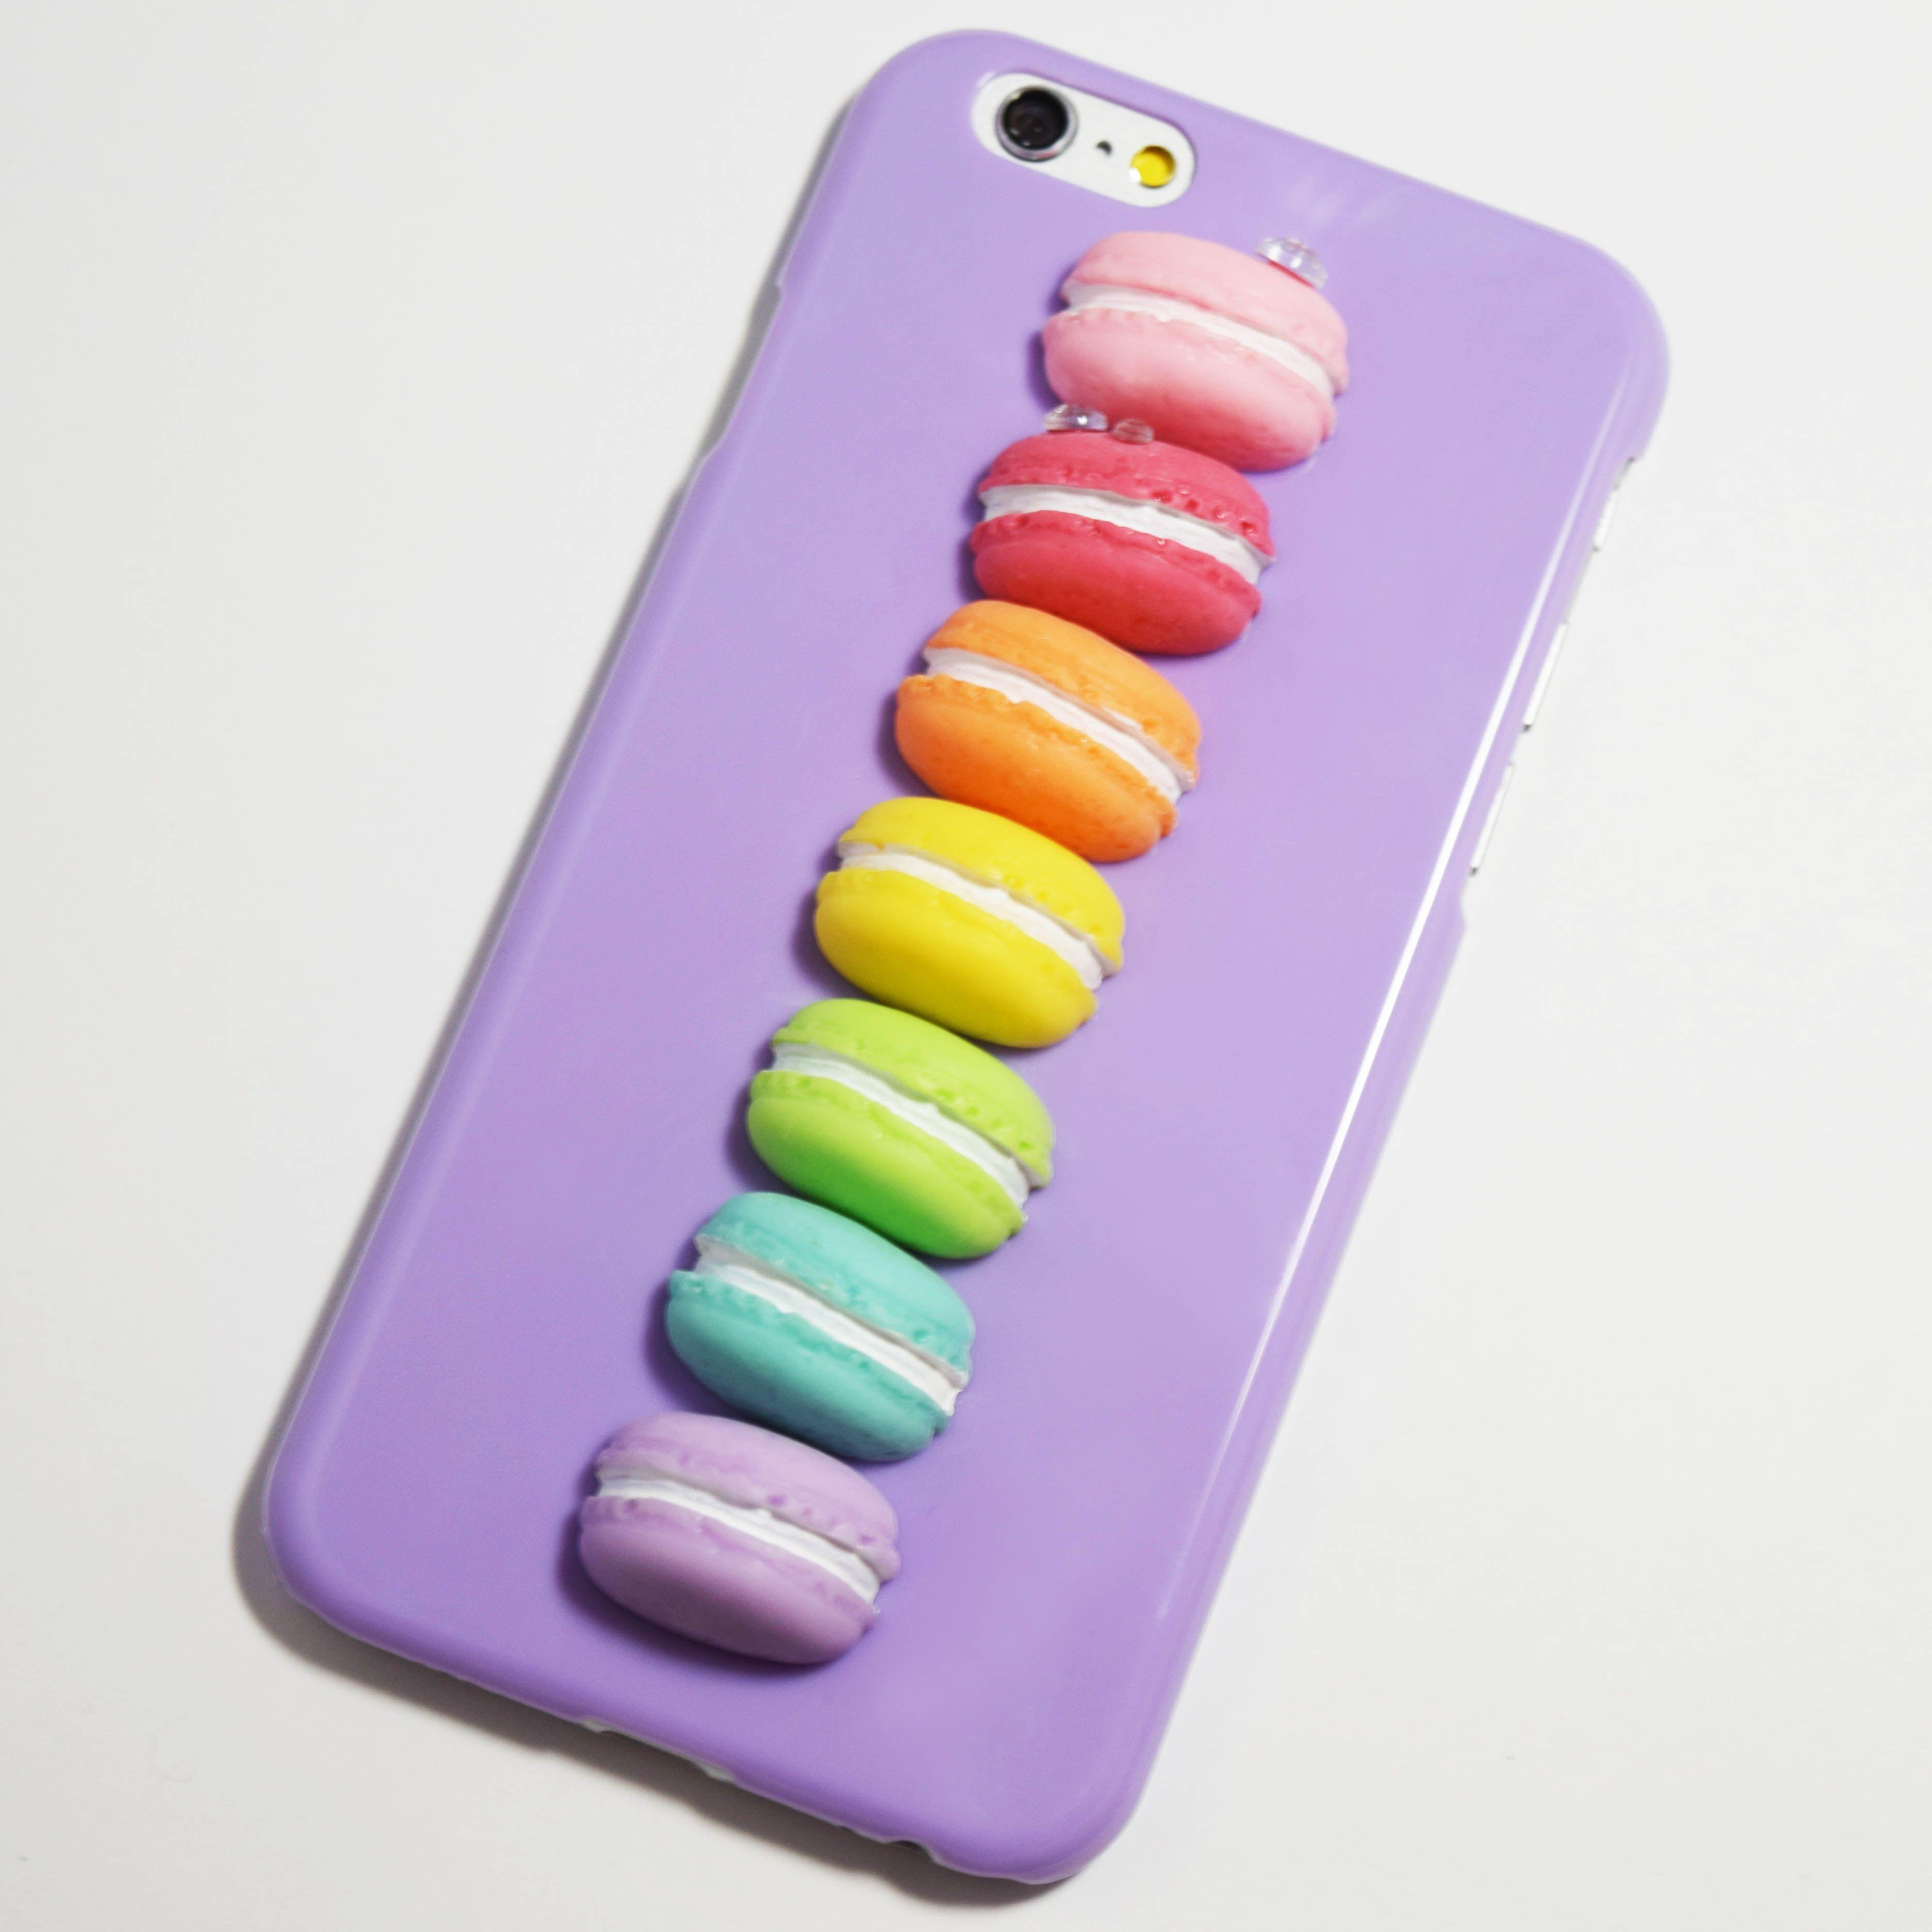 Pink 3D Macarons iPhone 6 / 6S Hard Case - Retailite | Iphone ...